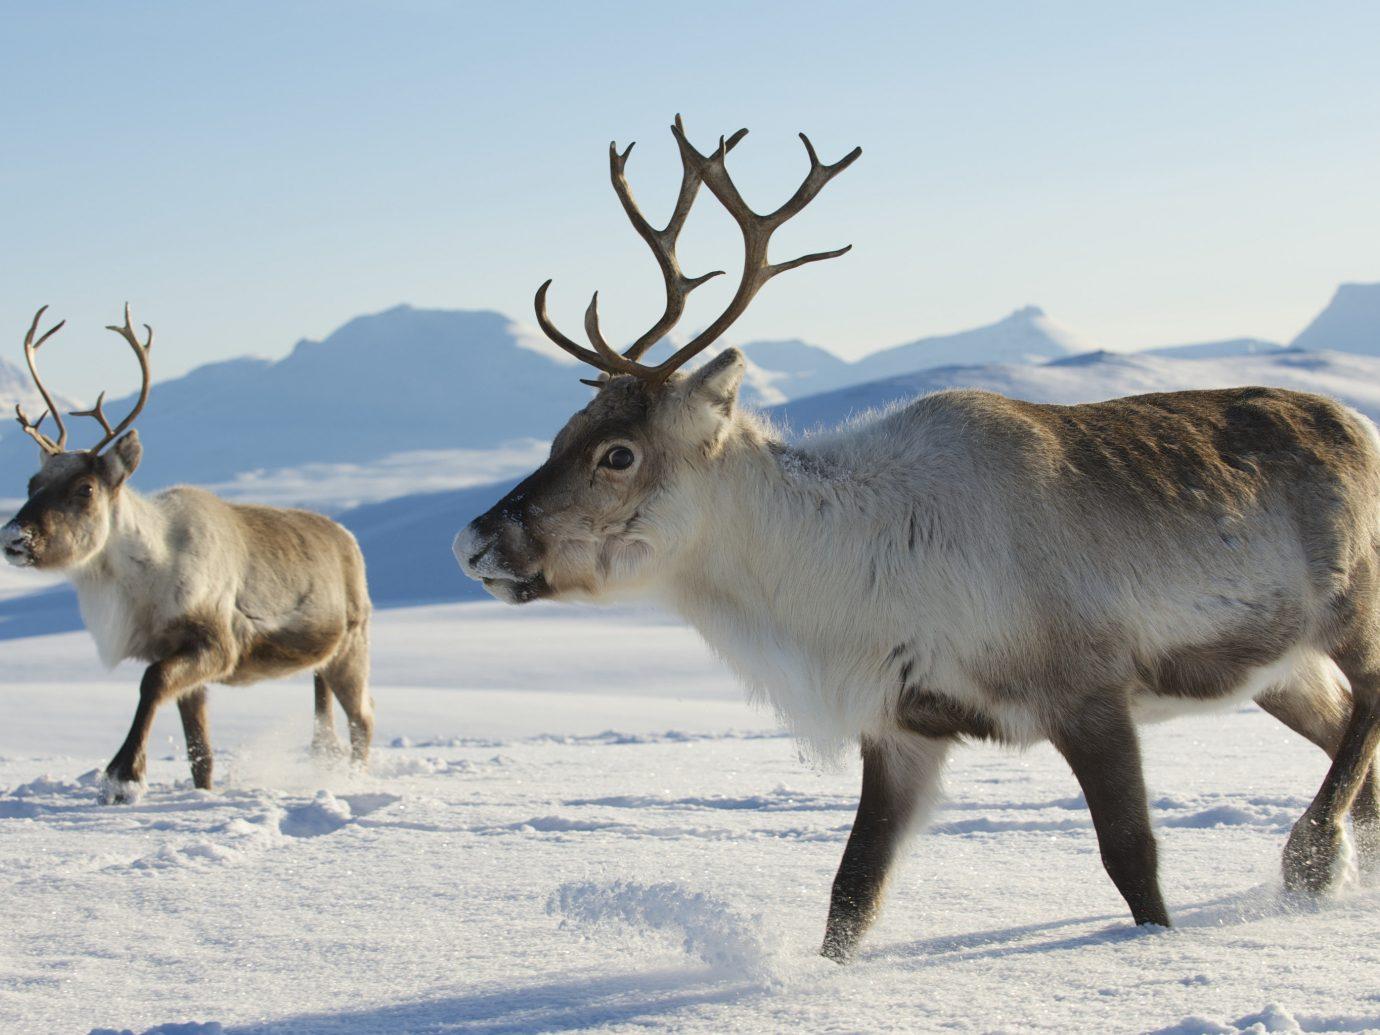 Adventure Boutique Hotels Romance Trip Ideas sky animal outdoor mammal deer reindeer Wildlife snow tundra freezing elk arctic Winter cattle like mammal antler cattle day